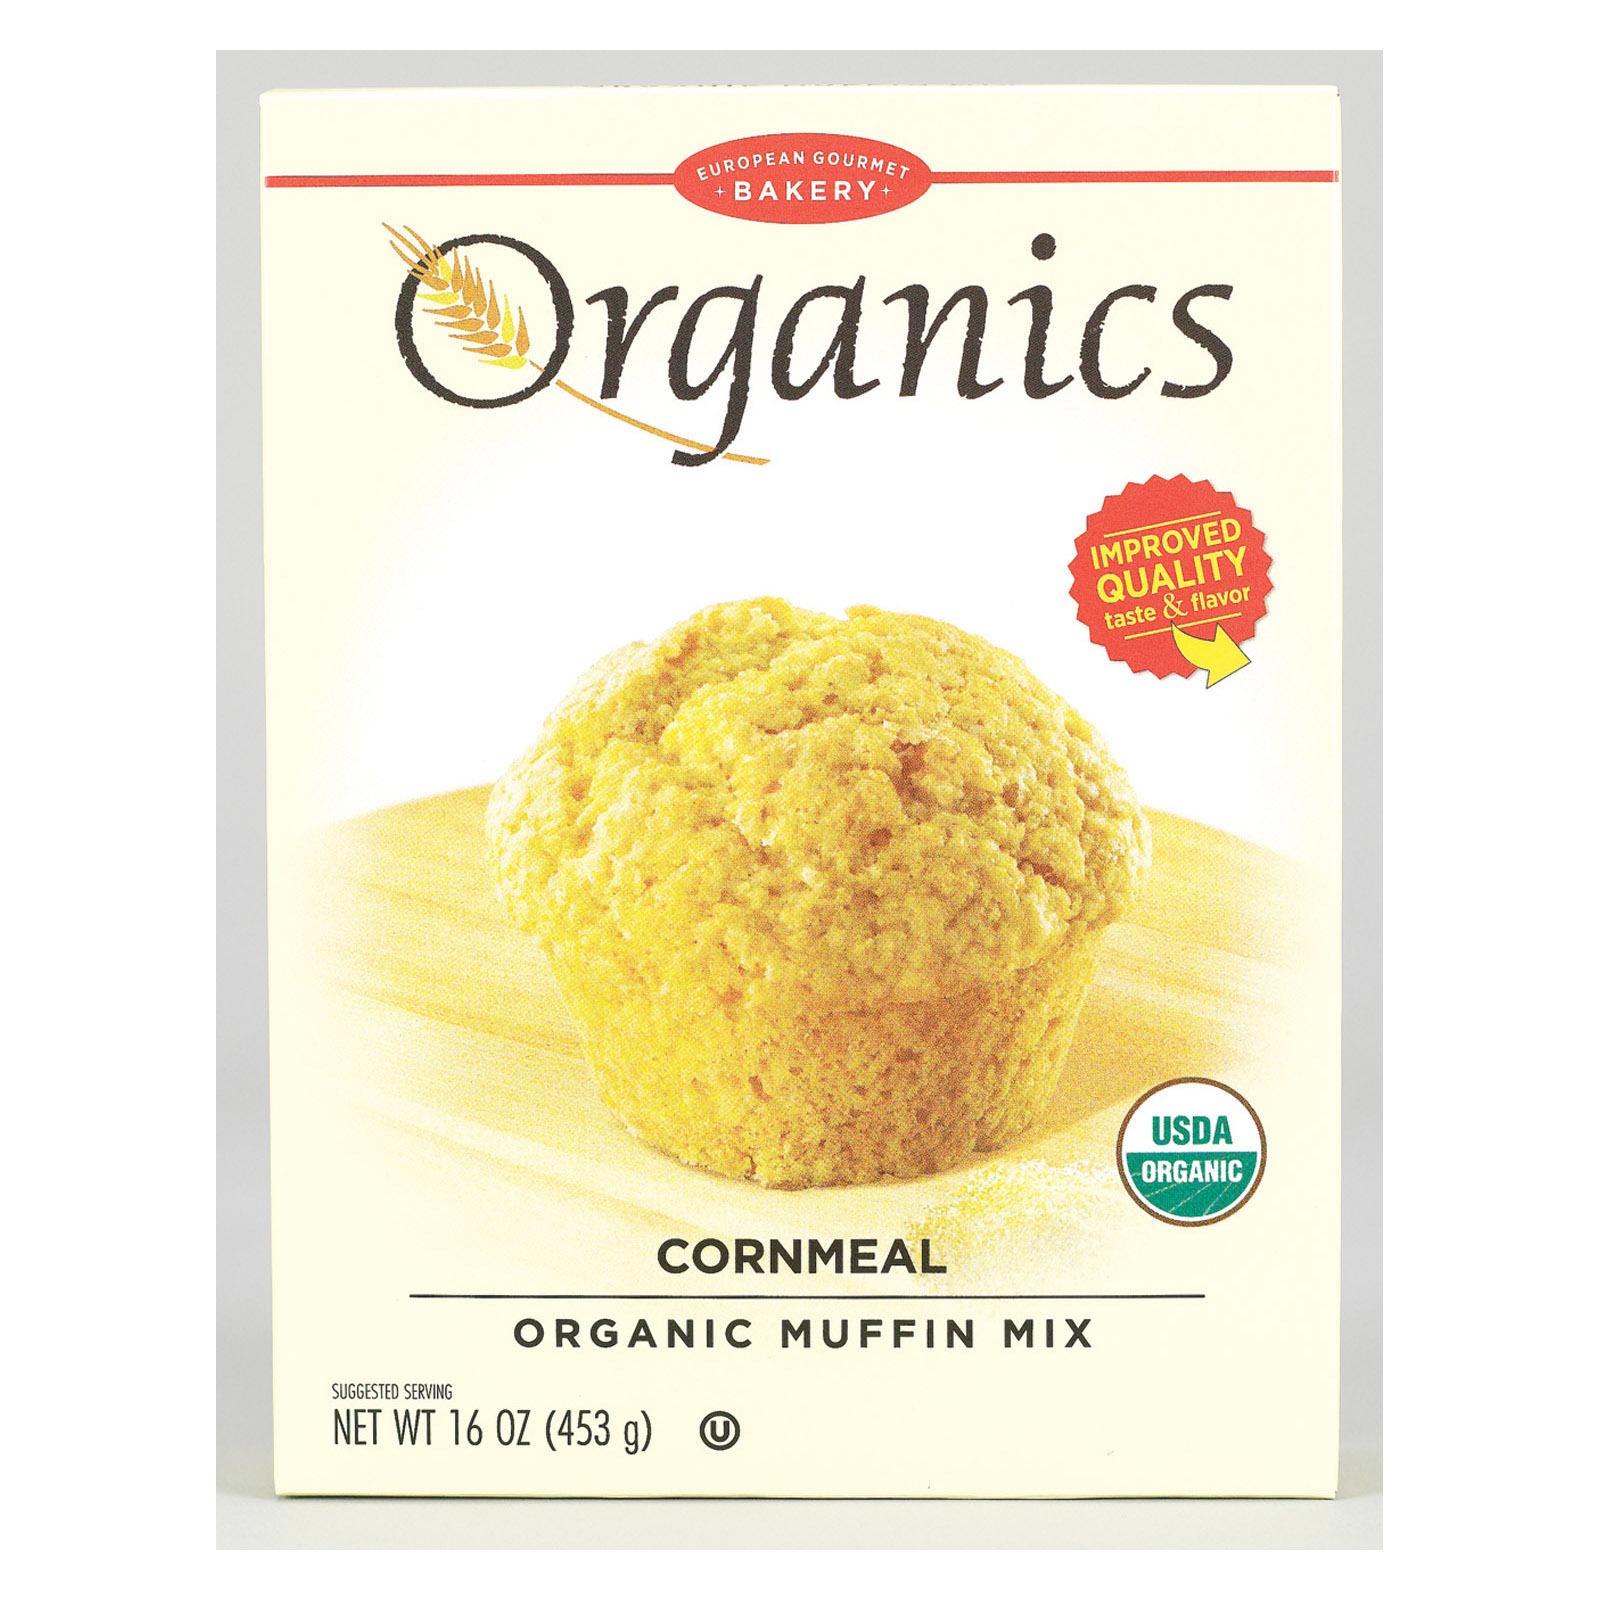 European Gourmet Bakery Organic Cornmeal Muffin Mix - Cornmeal - Case of 12 - 16 oz.